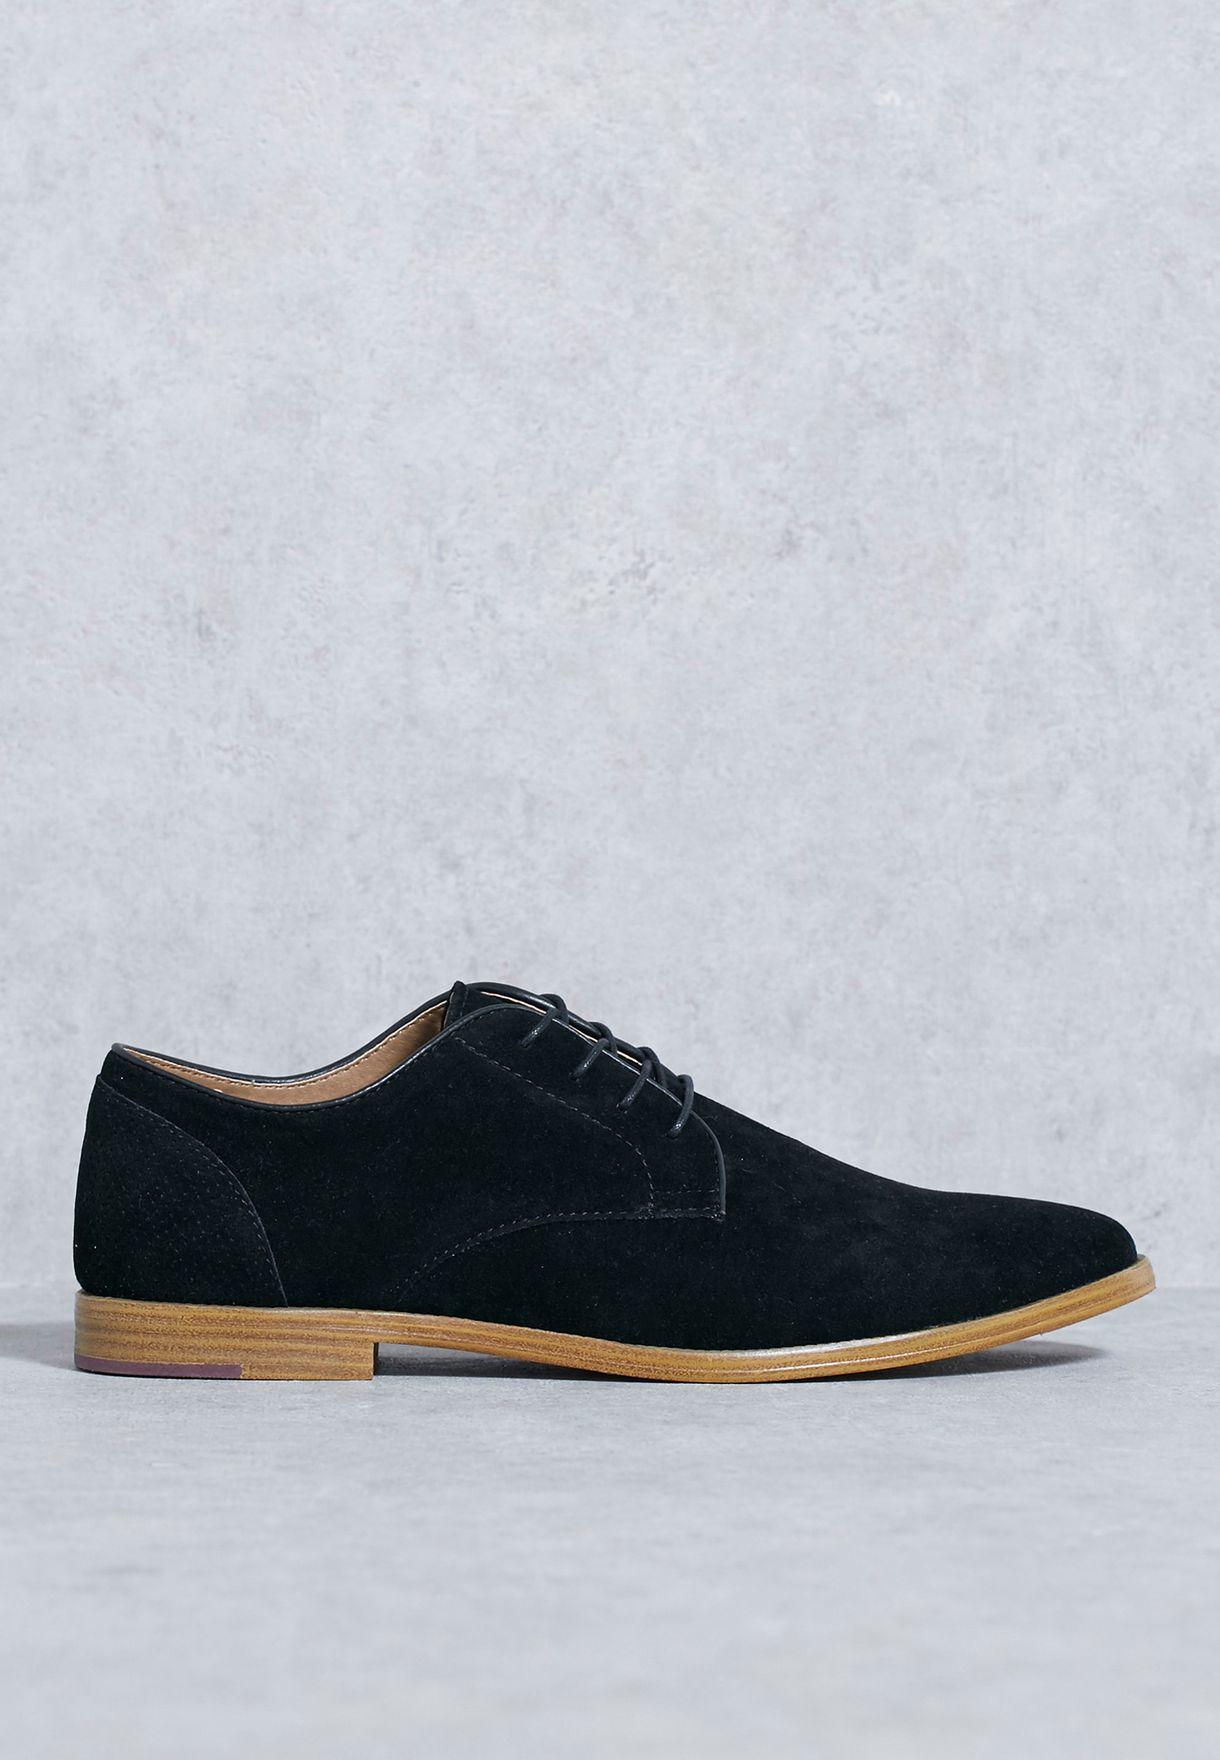 20b3db6b8fd11 Shop Topman black Harris Derby Shoes 76F28LBLK for Men in UAE ...